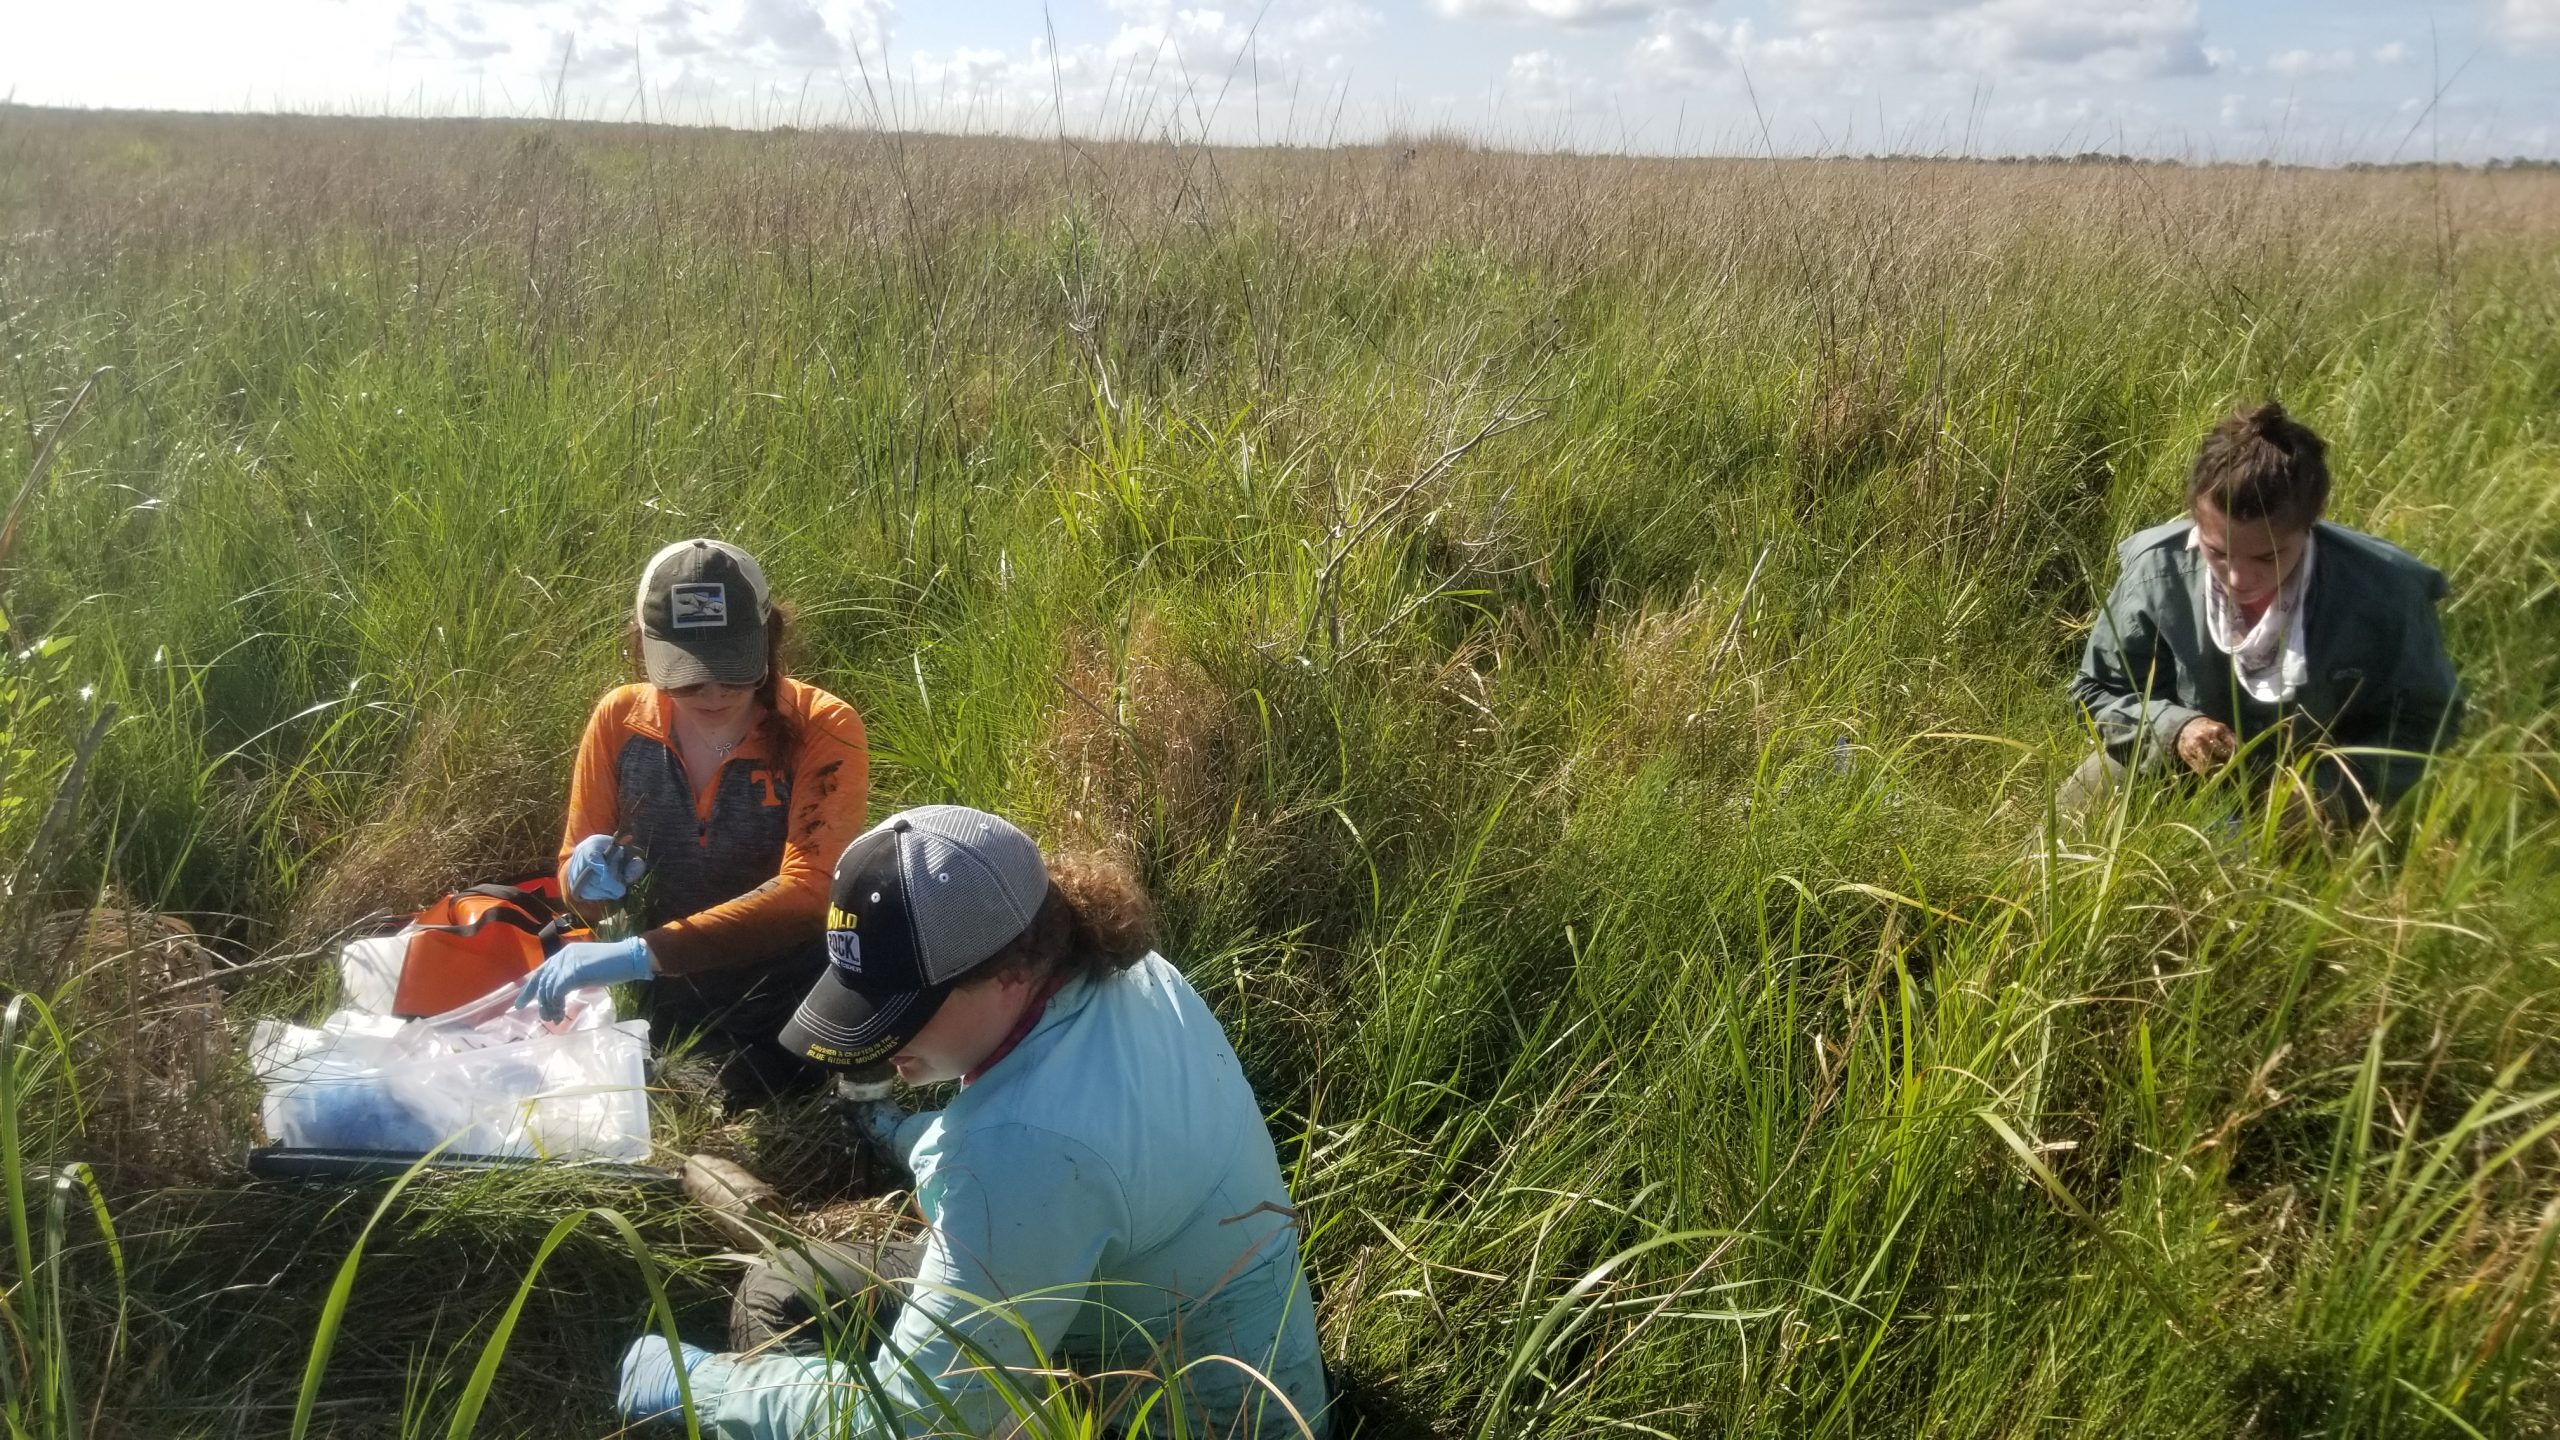 Sampling restored marsh for microbial communities and biogeochemistry. Credit: Annette Engel